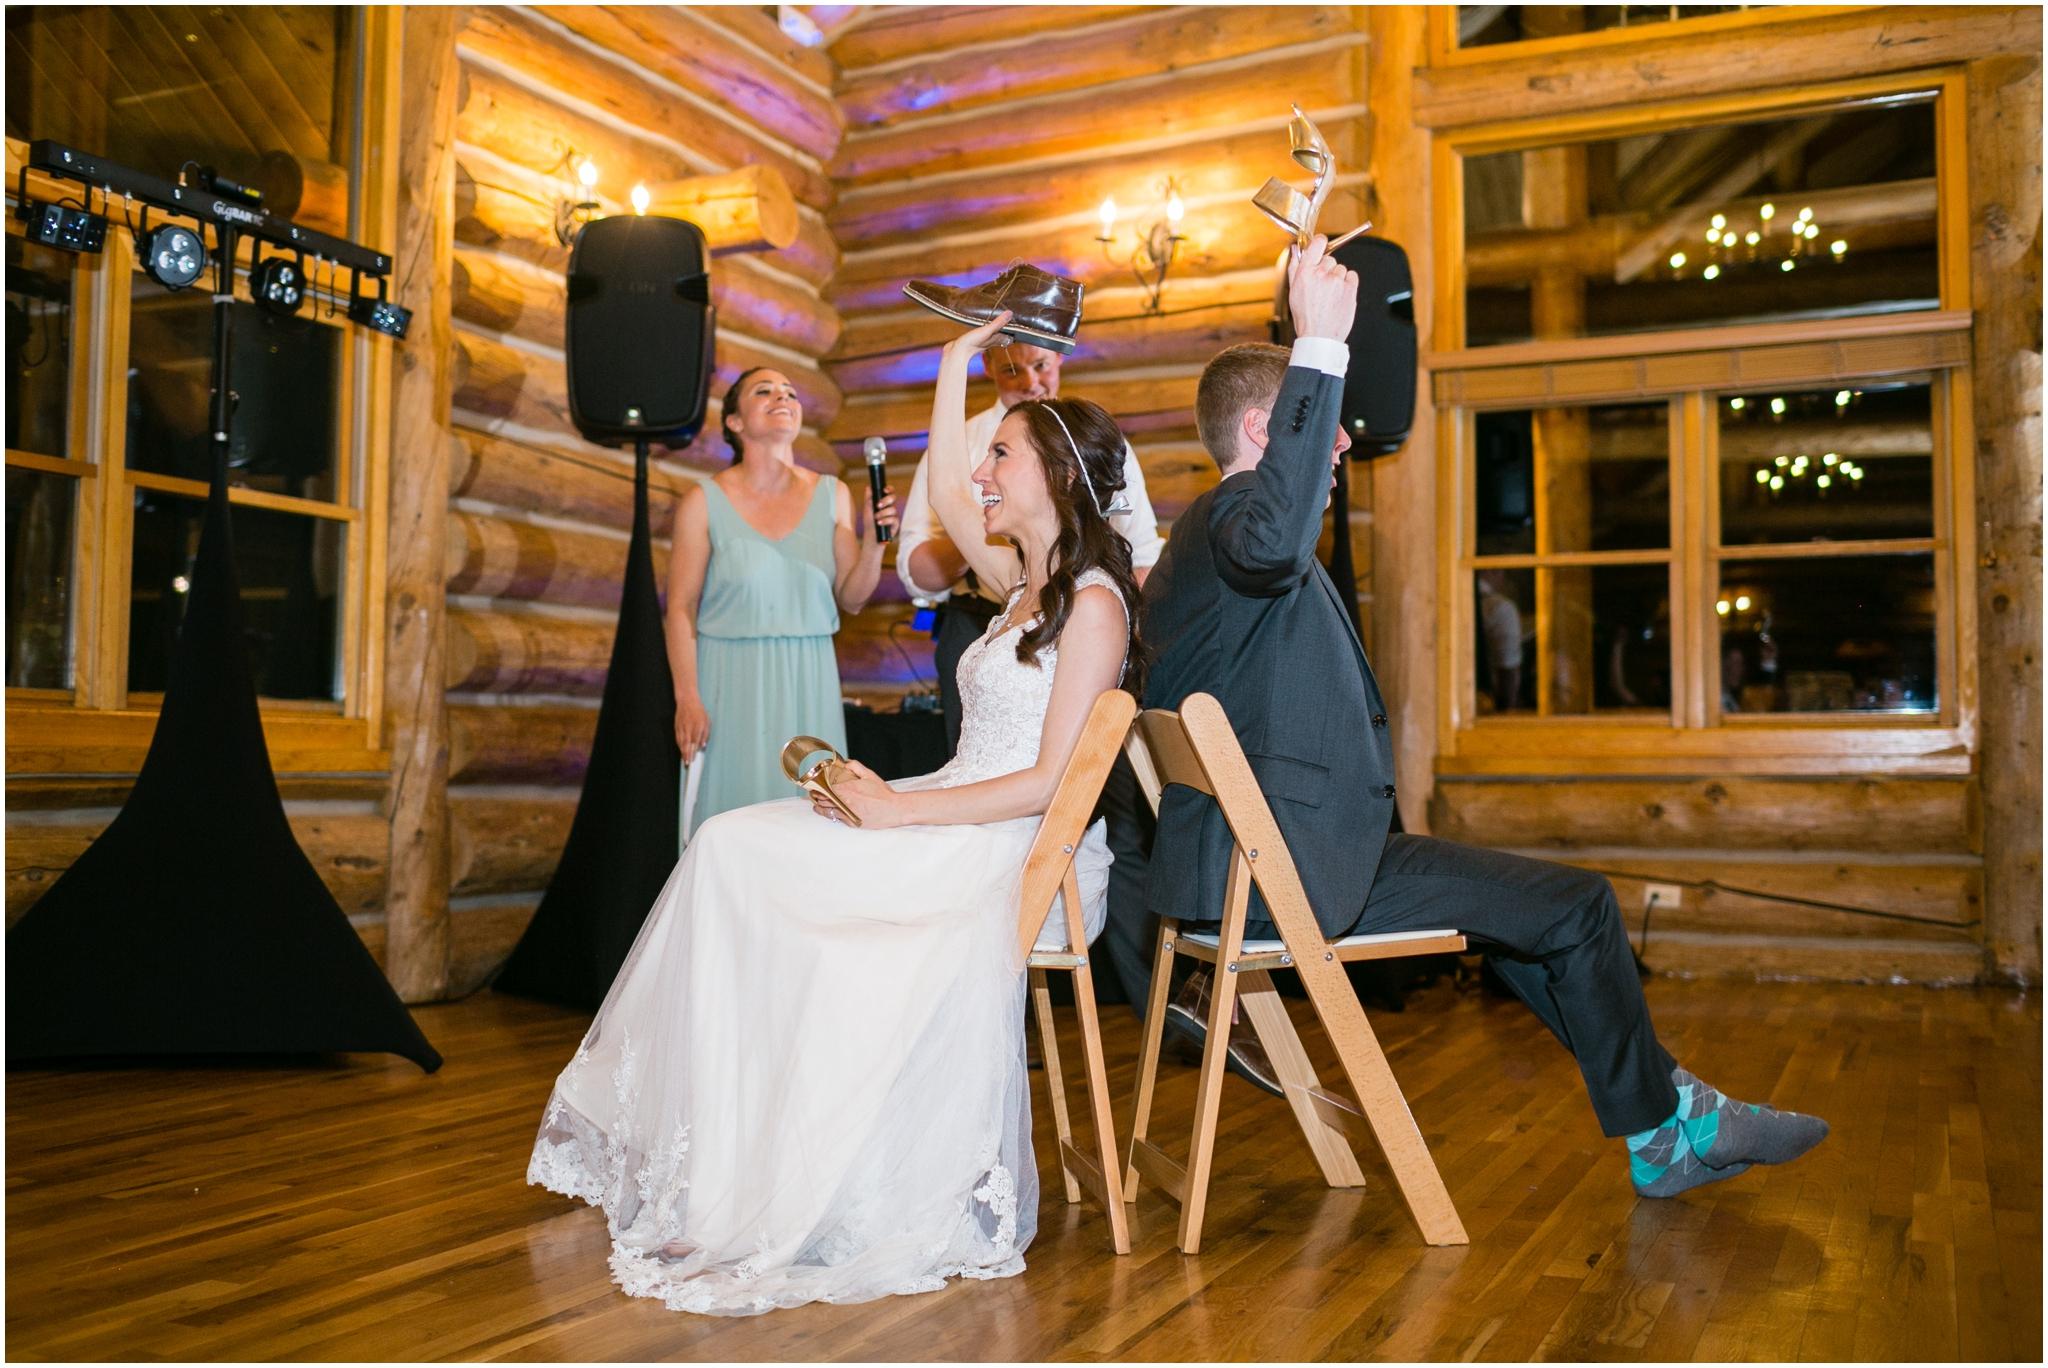 Evergreen_Wedding_Photos_Shoe_Game.JPG